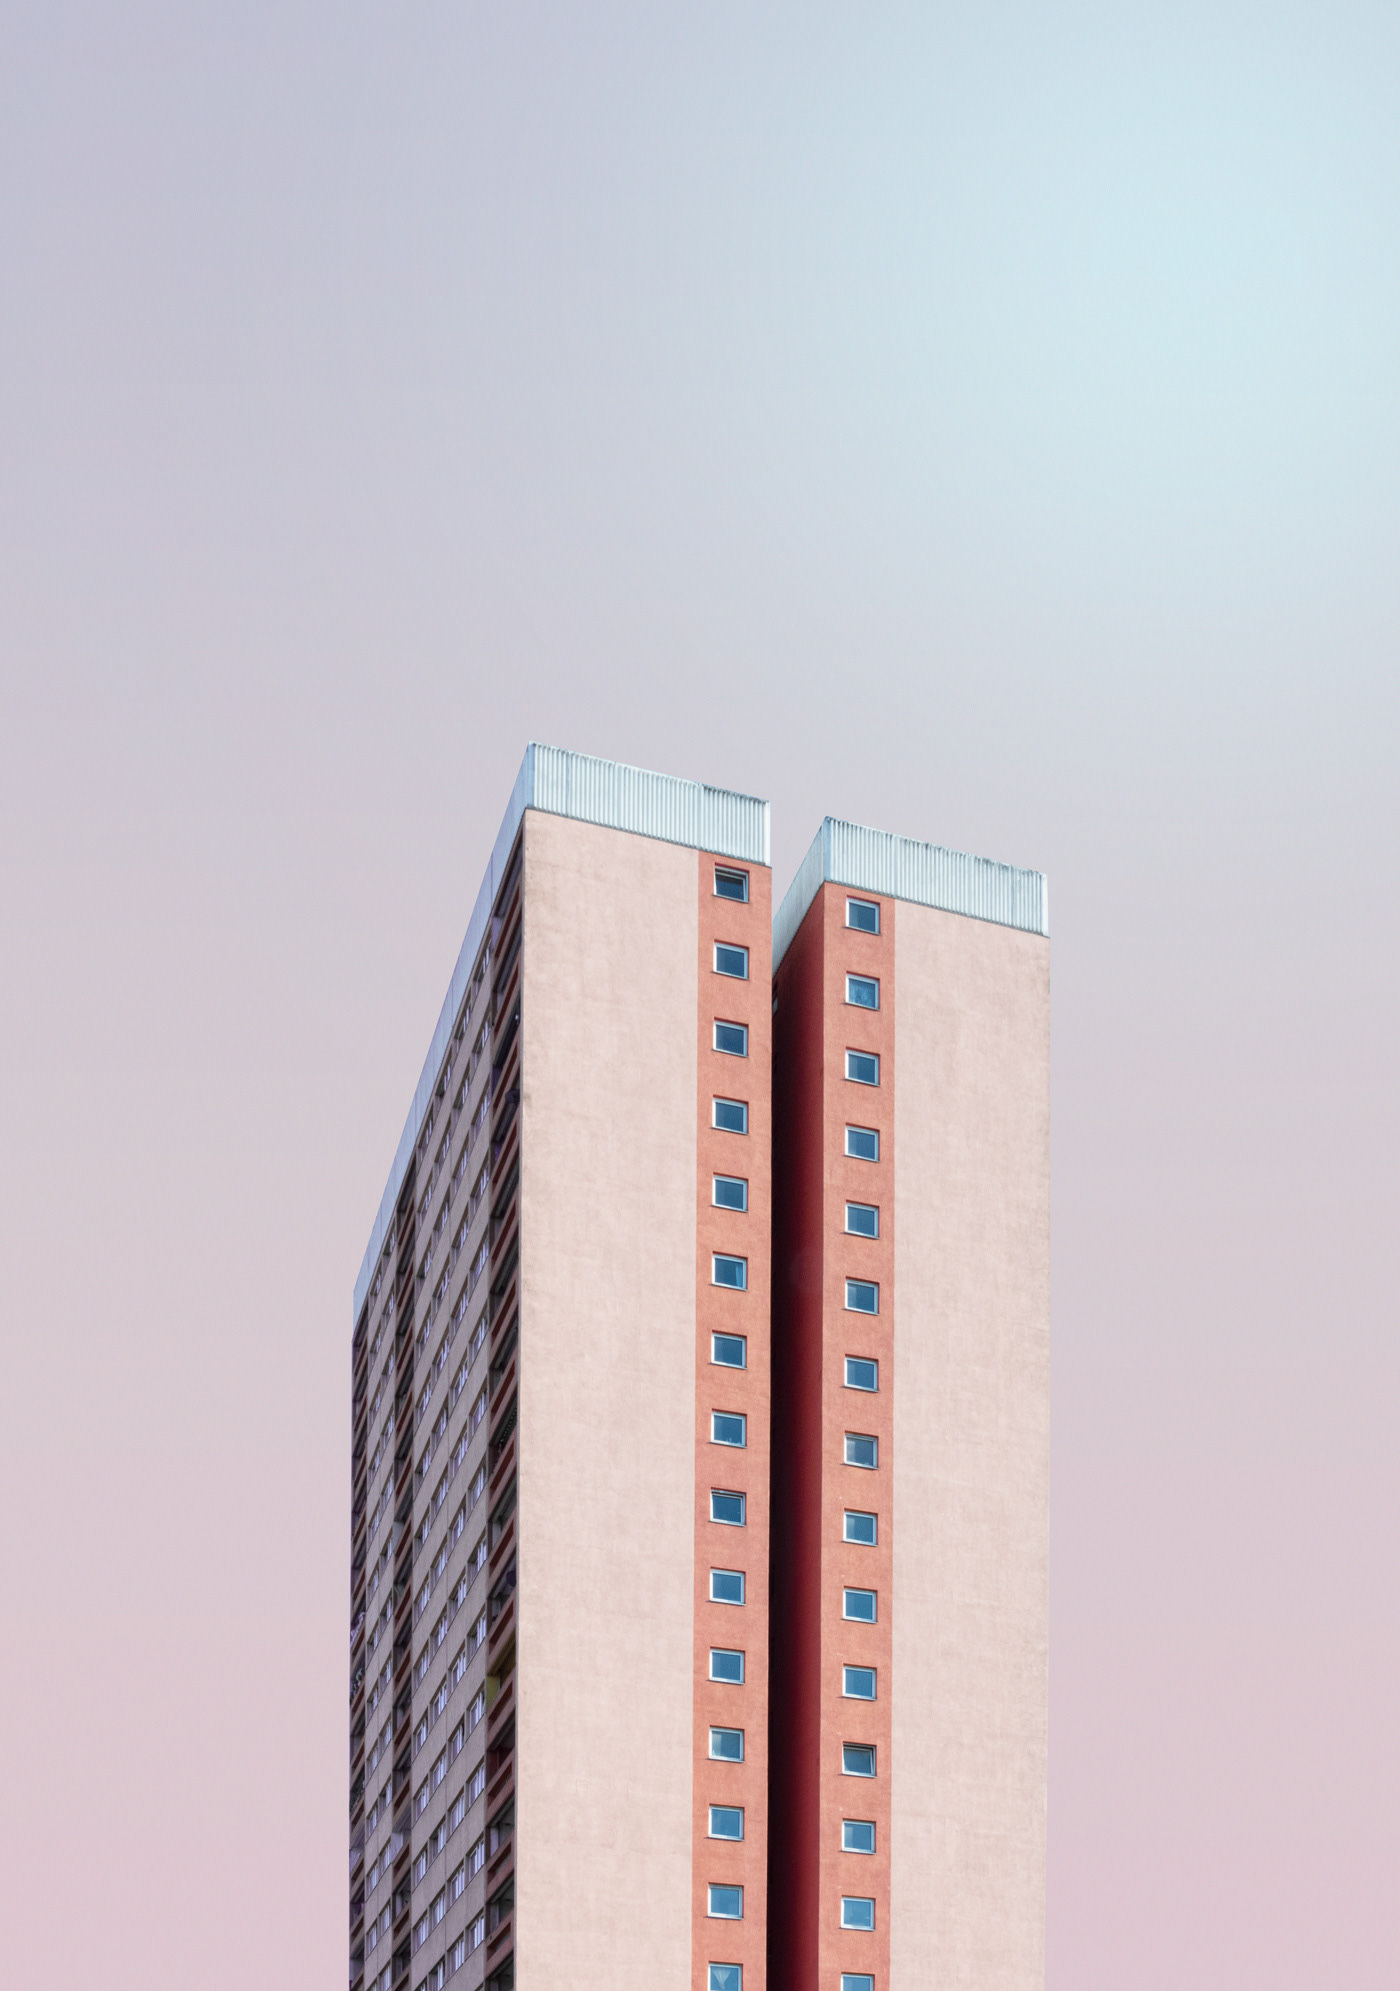 architecture berlin building city geometry London minimal pastel Urban graphic